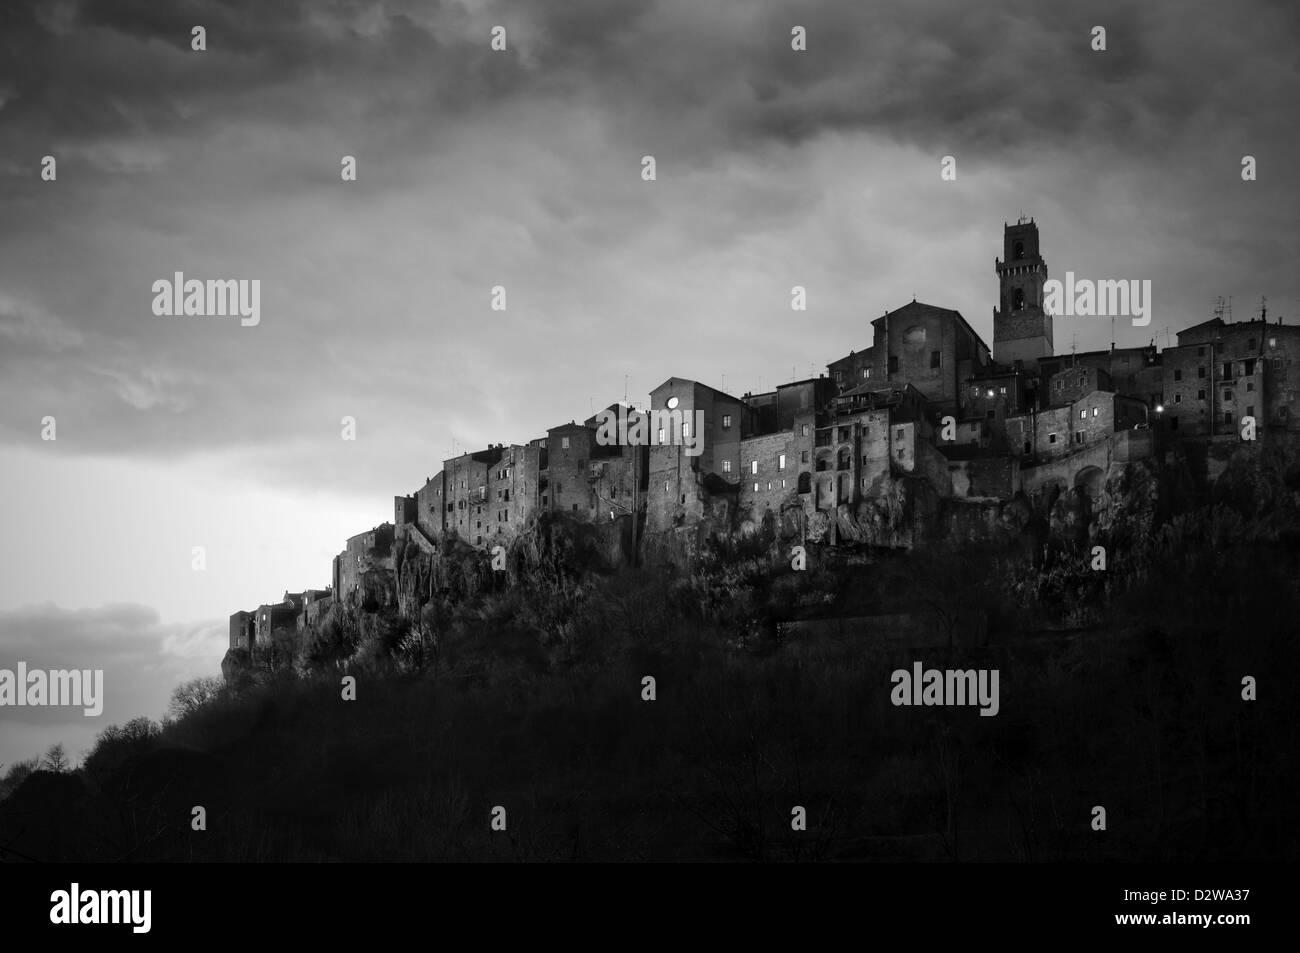 Pitigliano. Italy - Stock Image